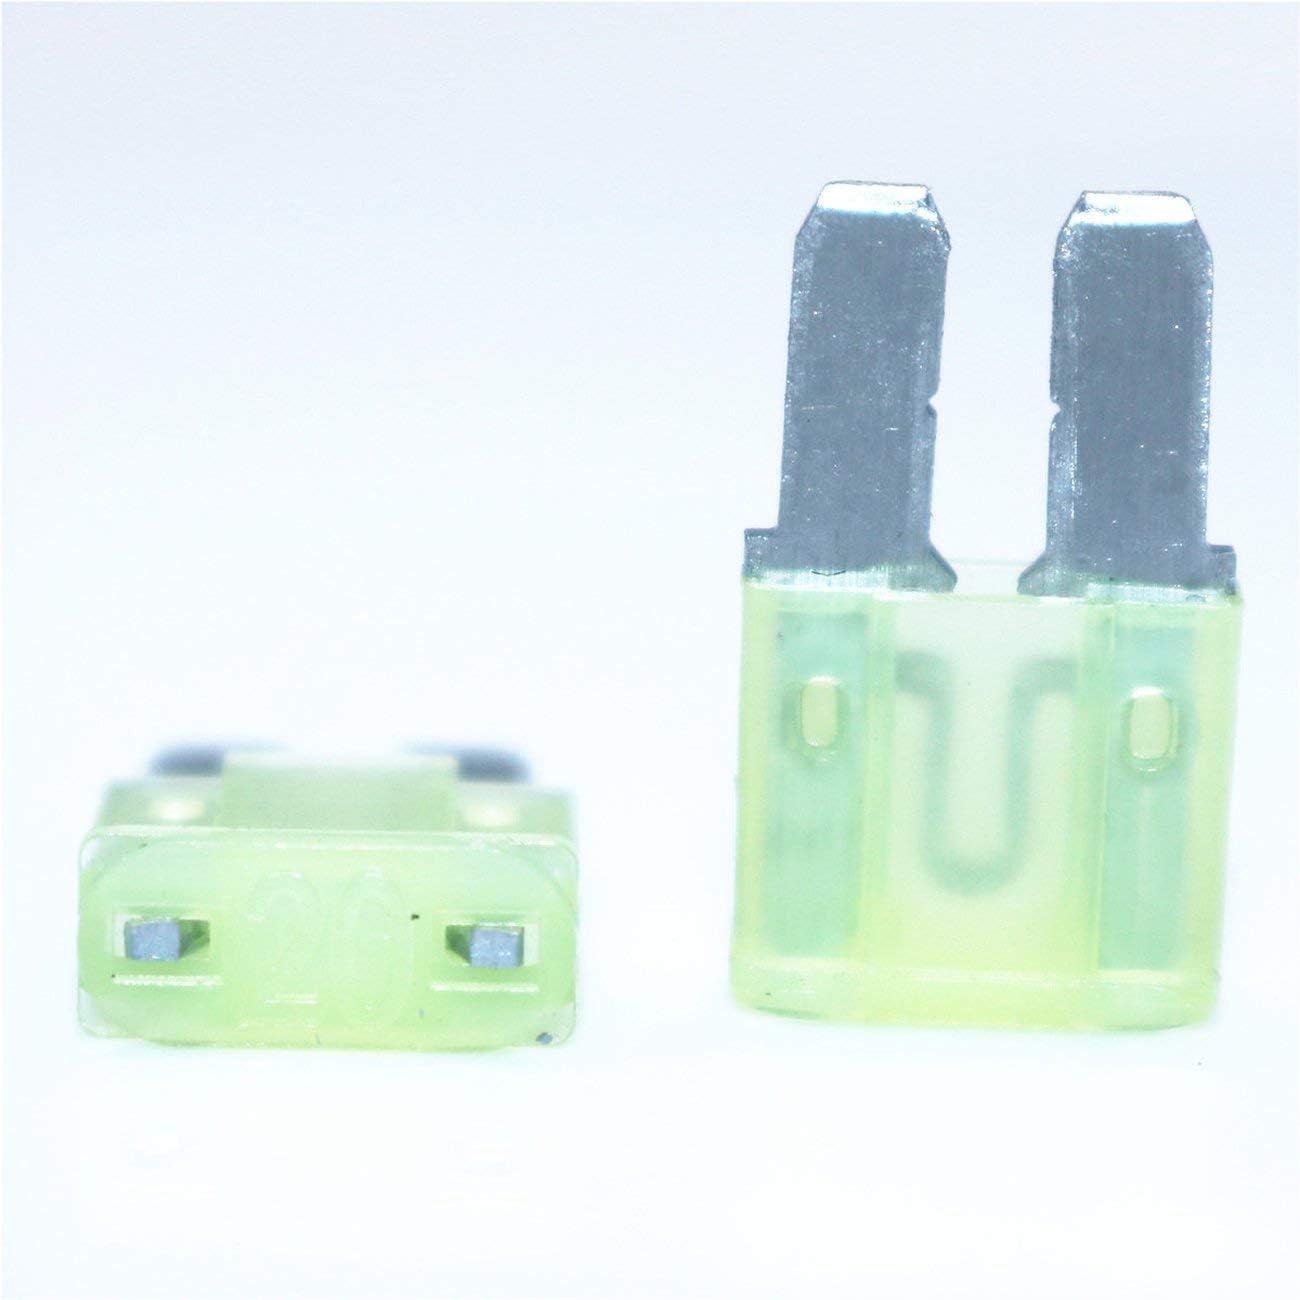 JIUY Micro2 ATR Automotive Fuses Assorted 10 pcs Lumision 5A 7.5A 10A 15A 20A Set Pak Auto Insurance Tablets colorful